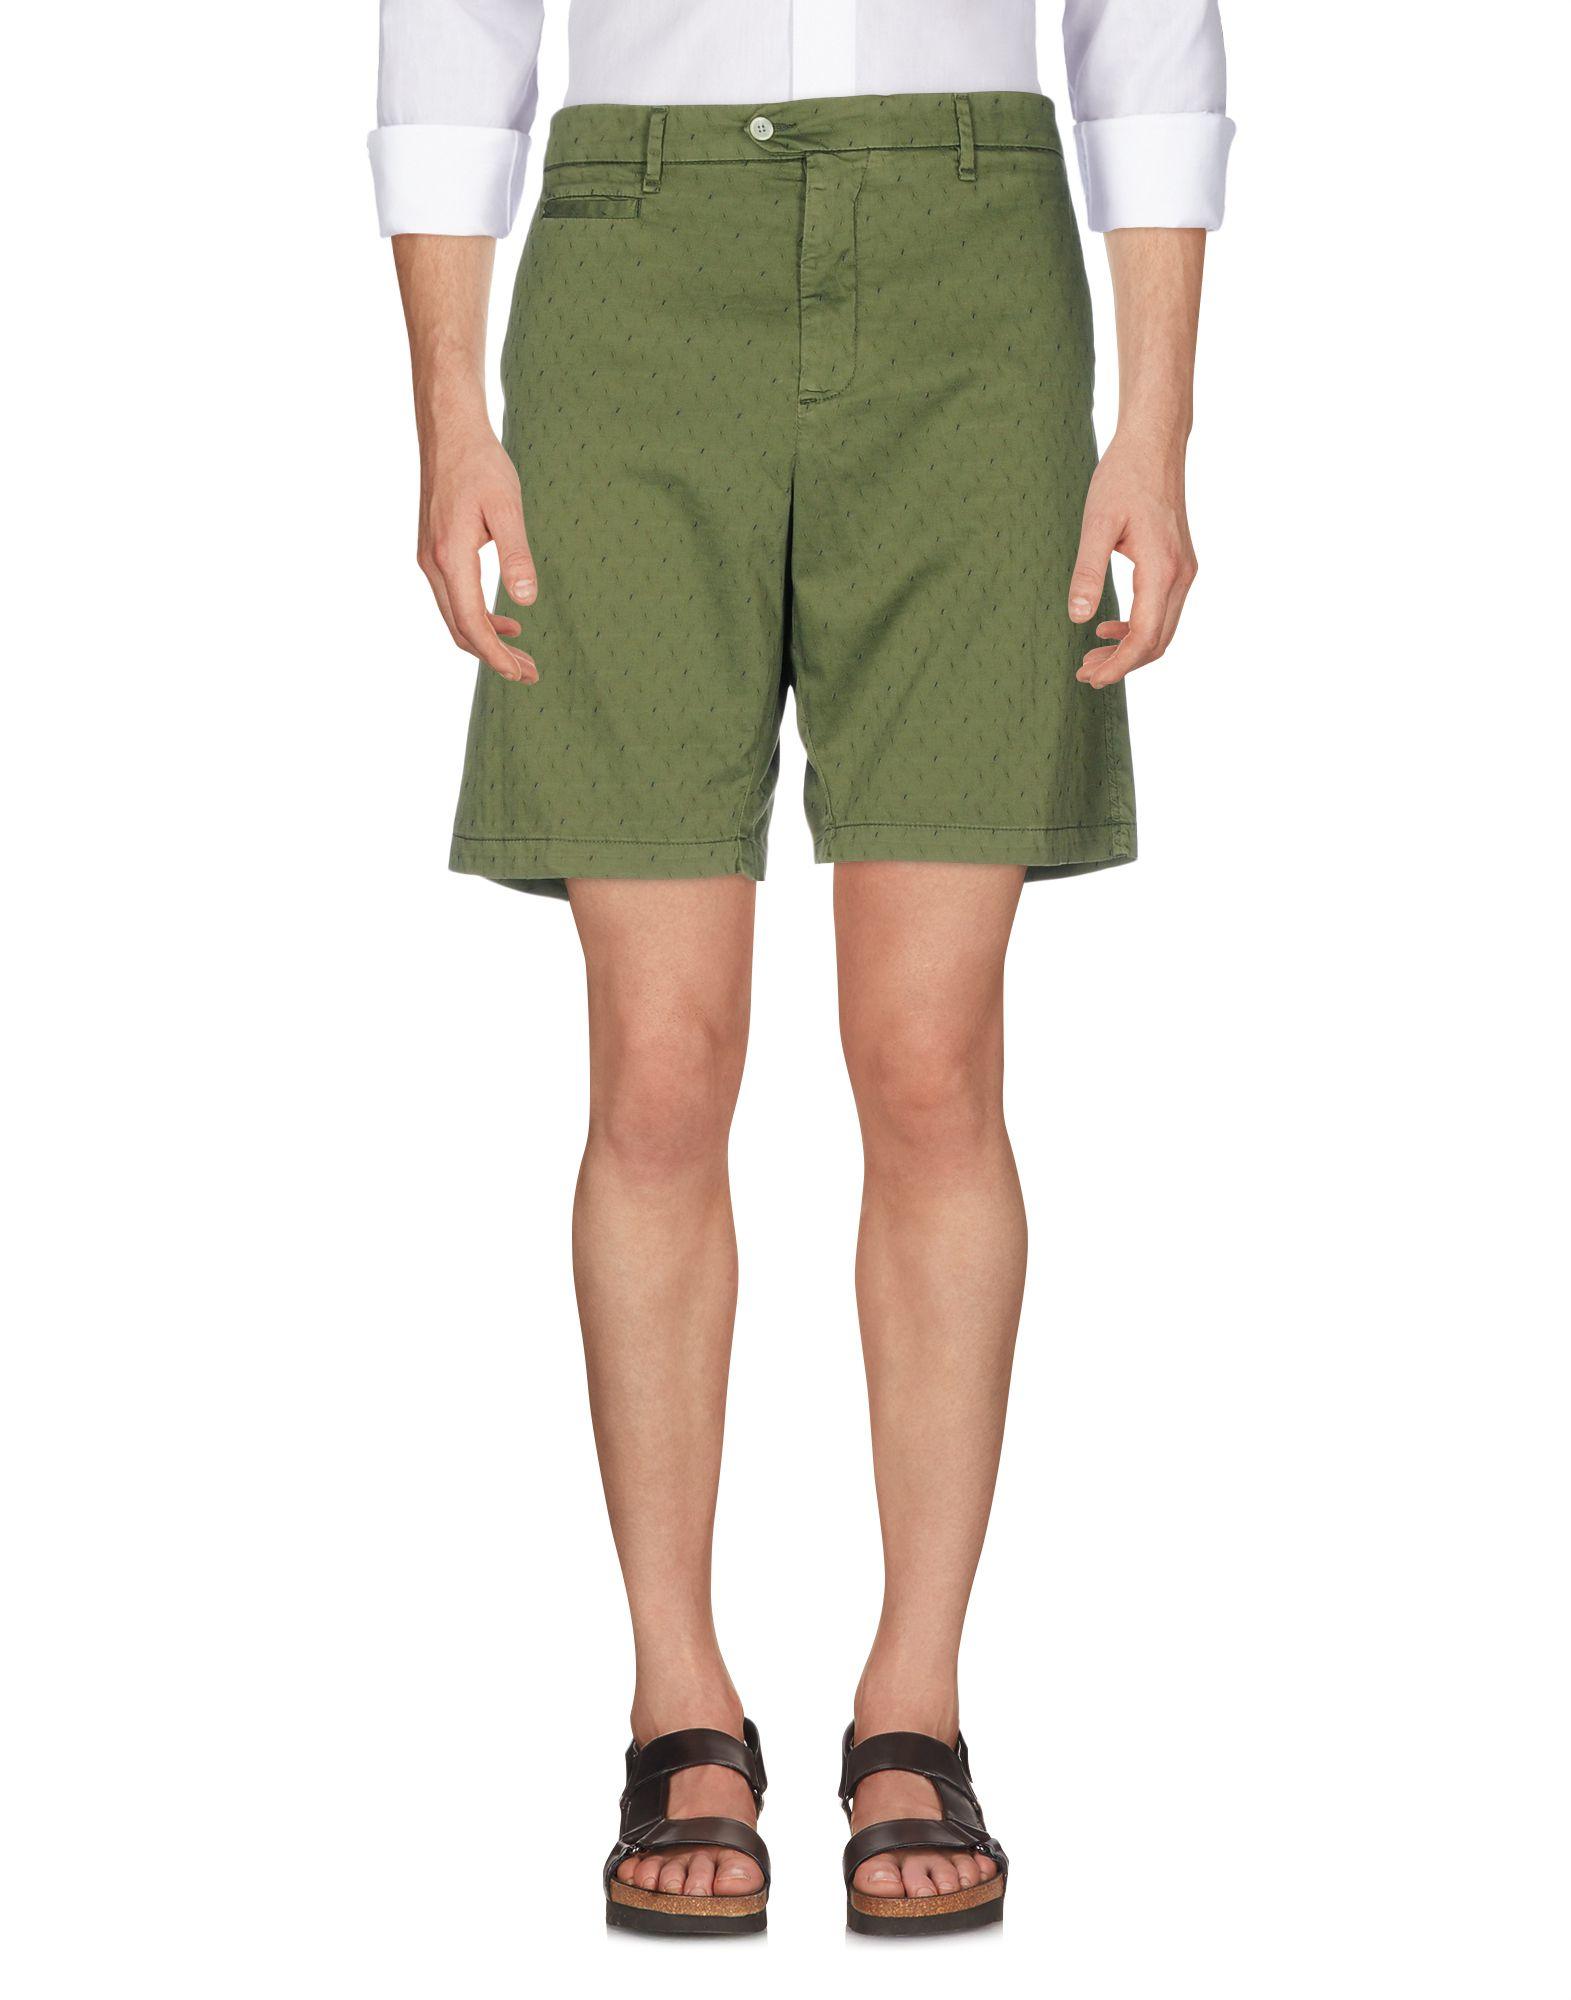 PERFECTION Shorts & Bermuda in Green